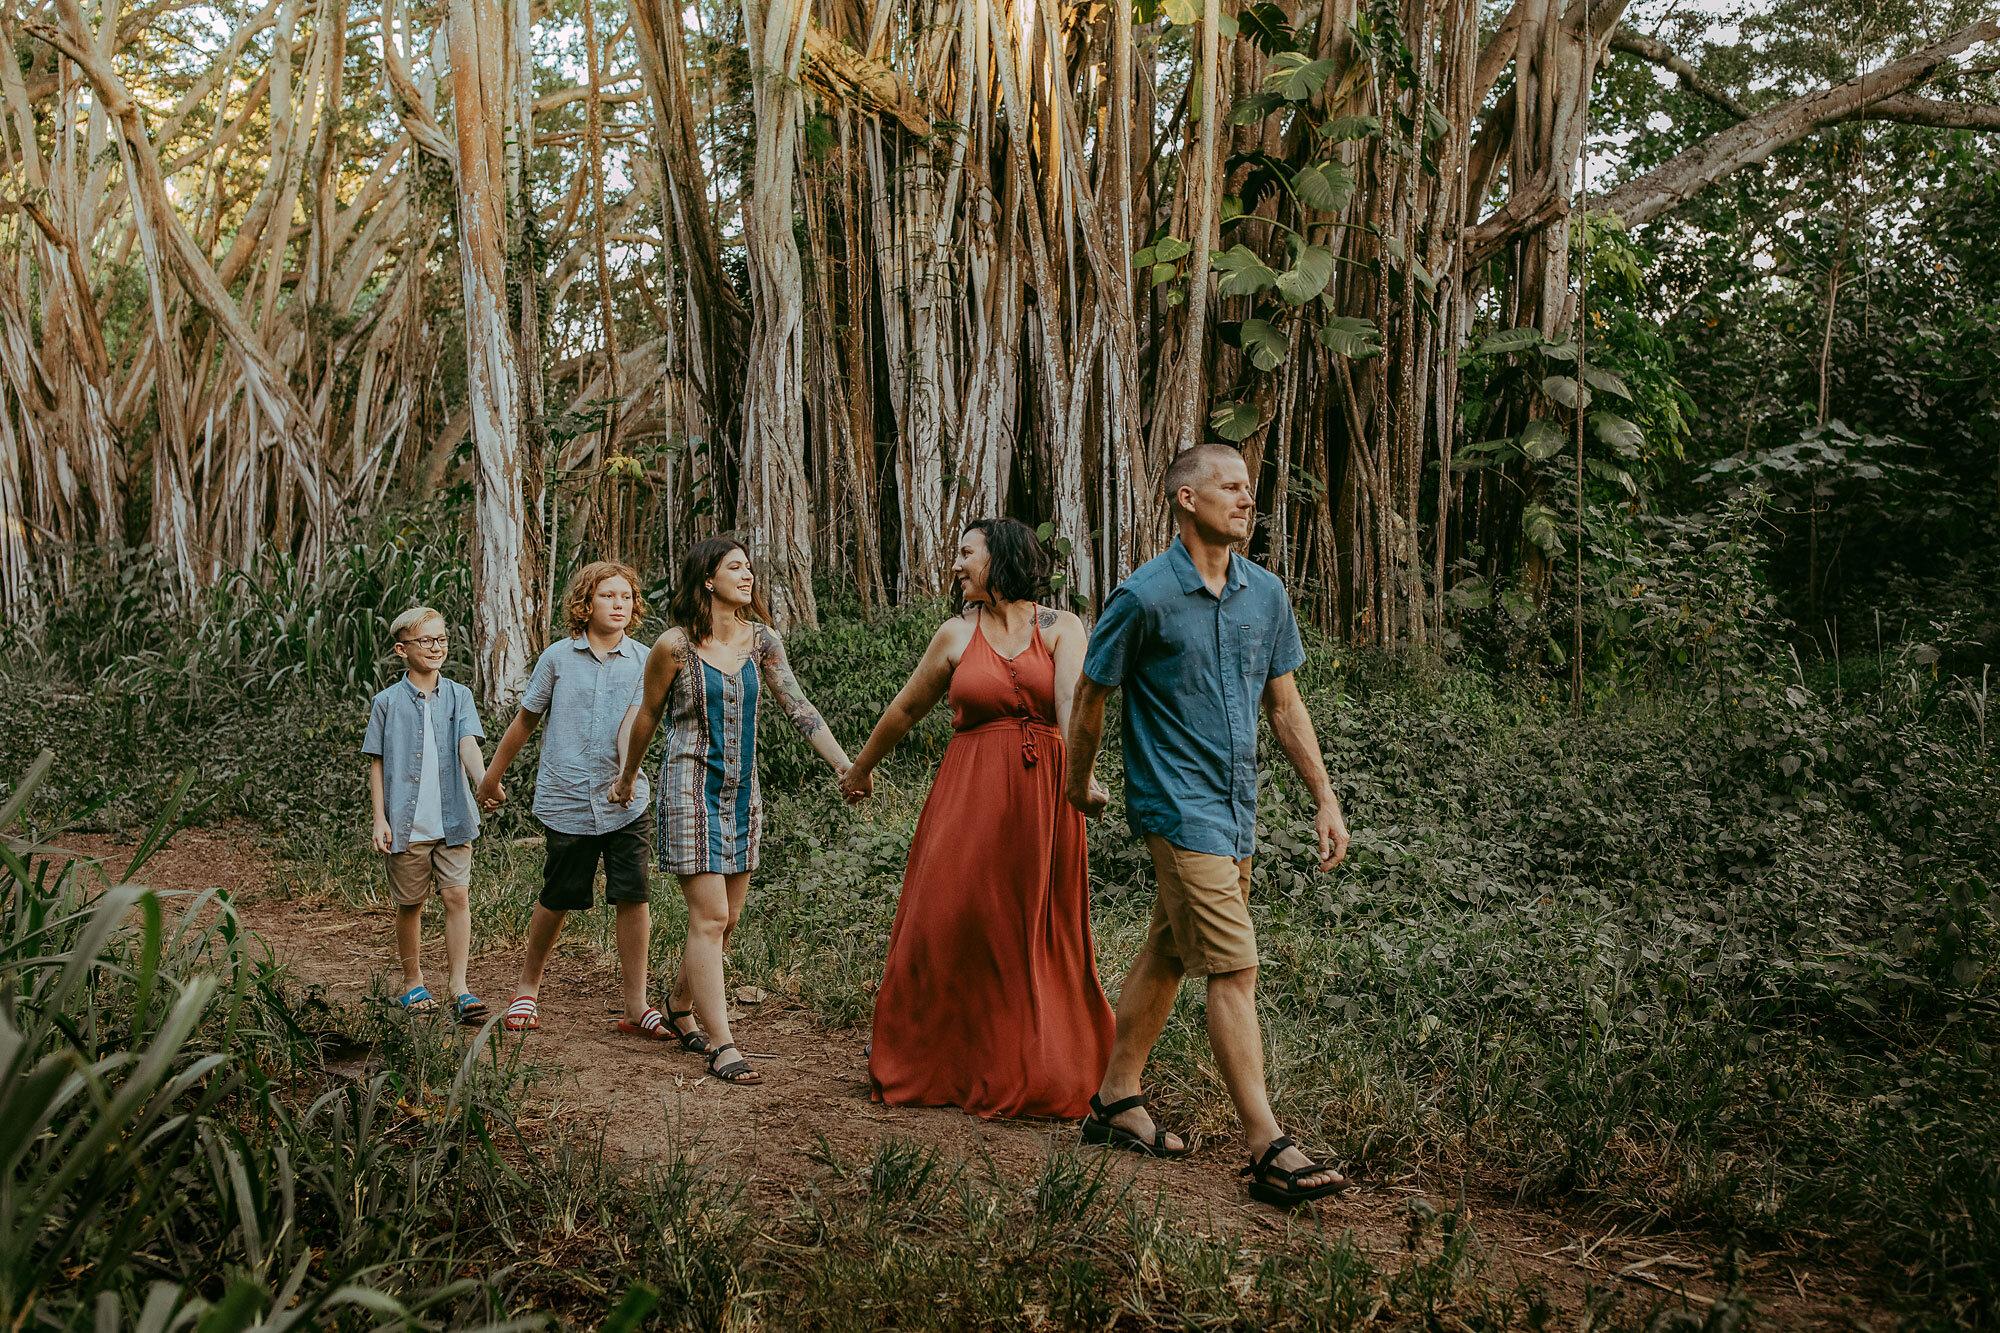 Oahu-Hawaii-Family-Photography-Family-Photos-04.jpg